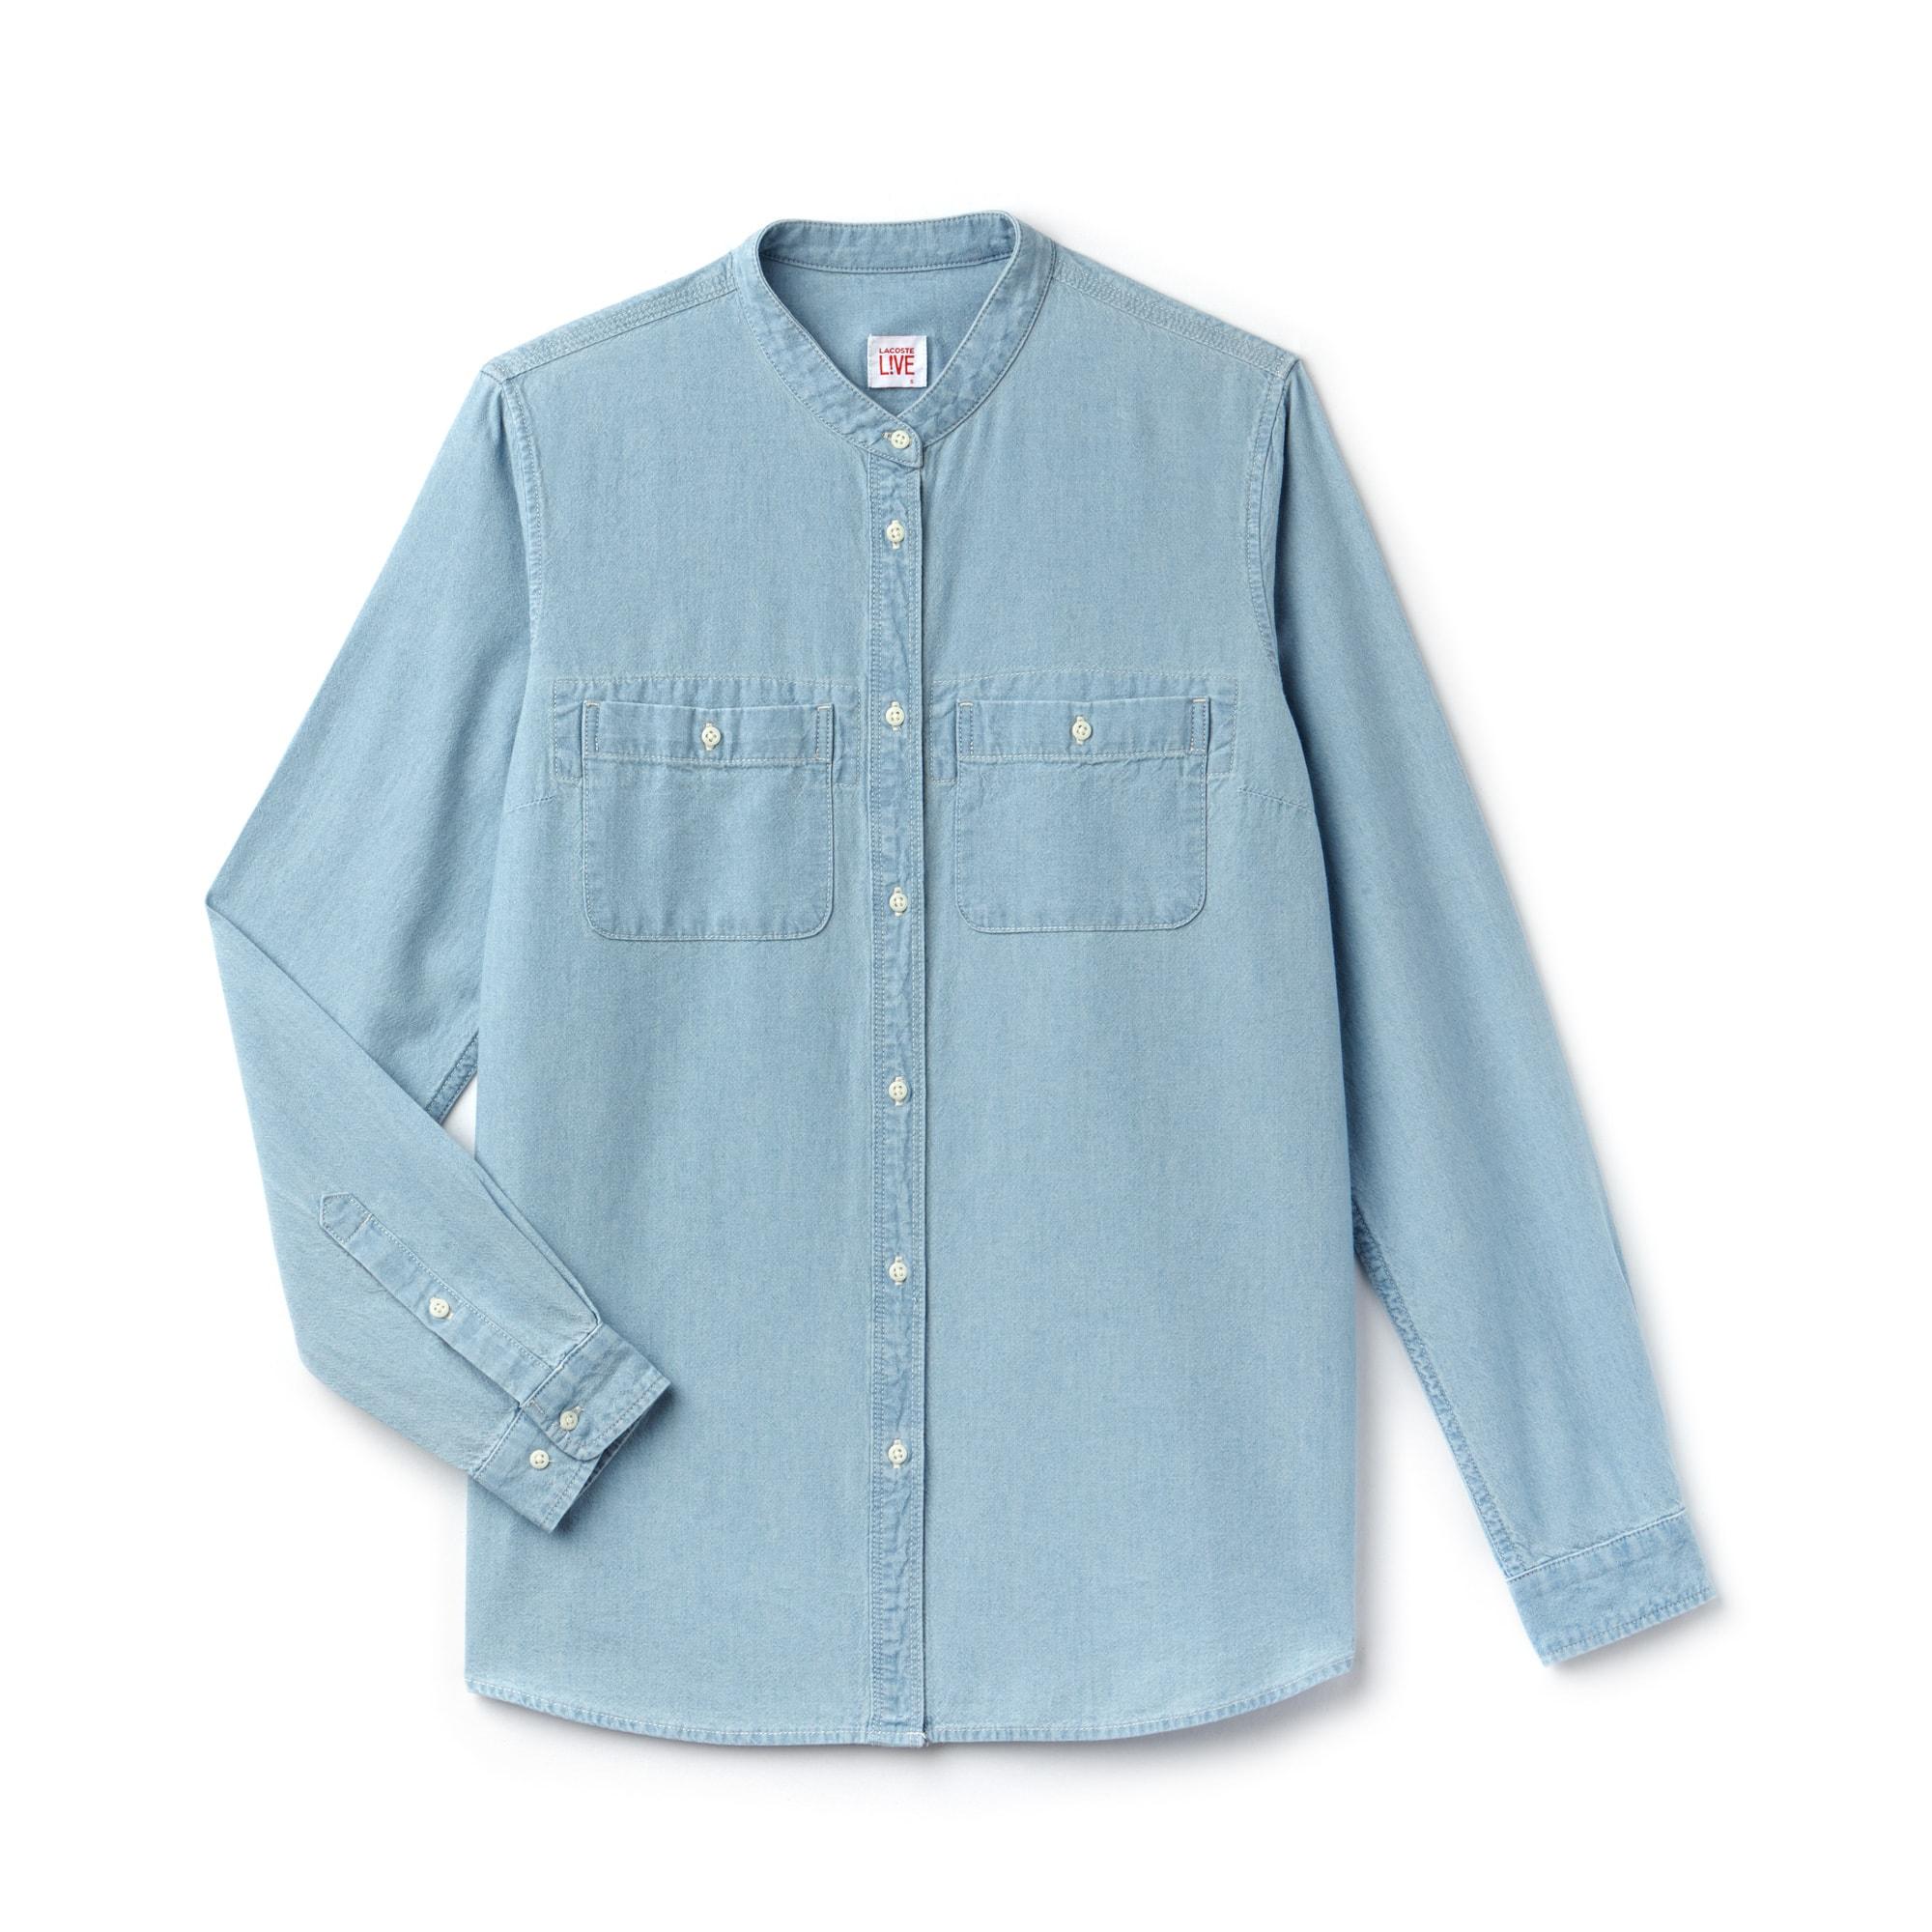 Lockere Damen-Bluse aus Chambray LACOSTE L!VE